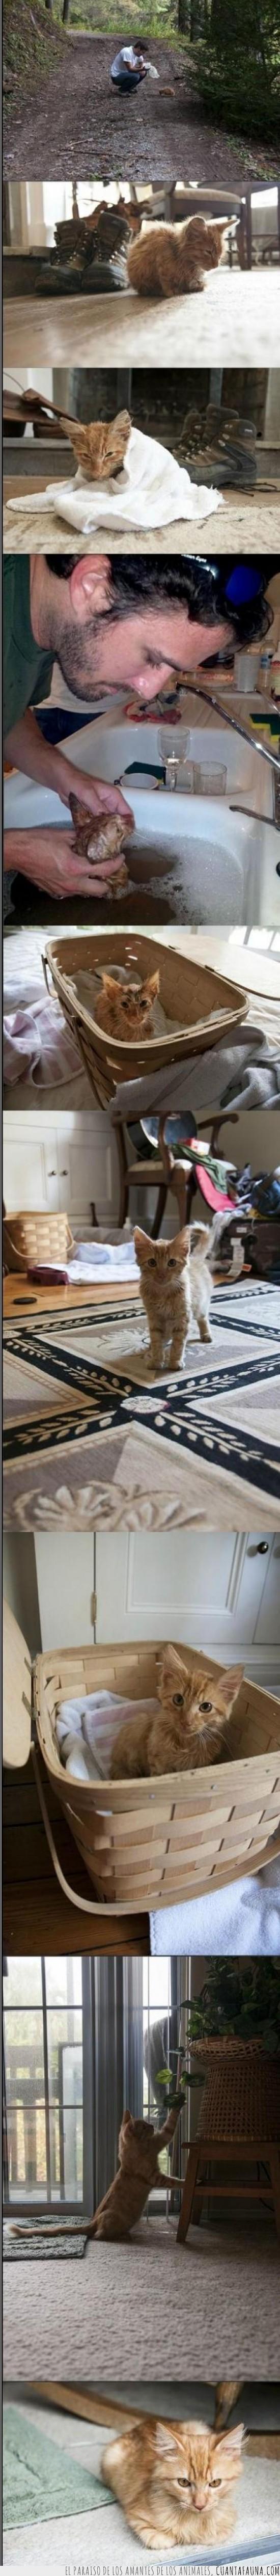 adopcion,amigo,gatito,gato salvado,mono,monte,sucio